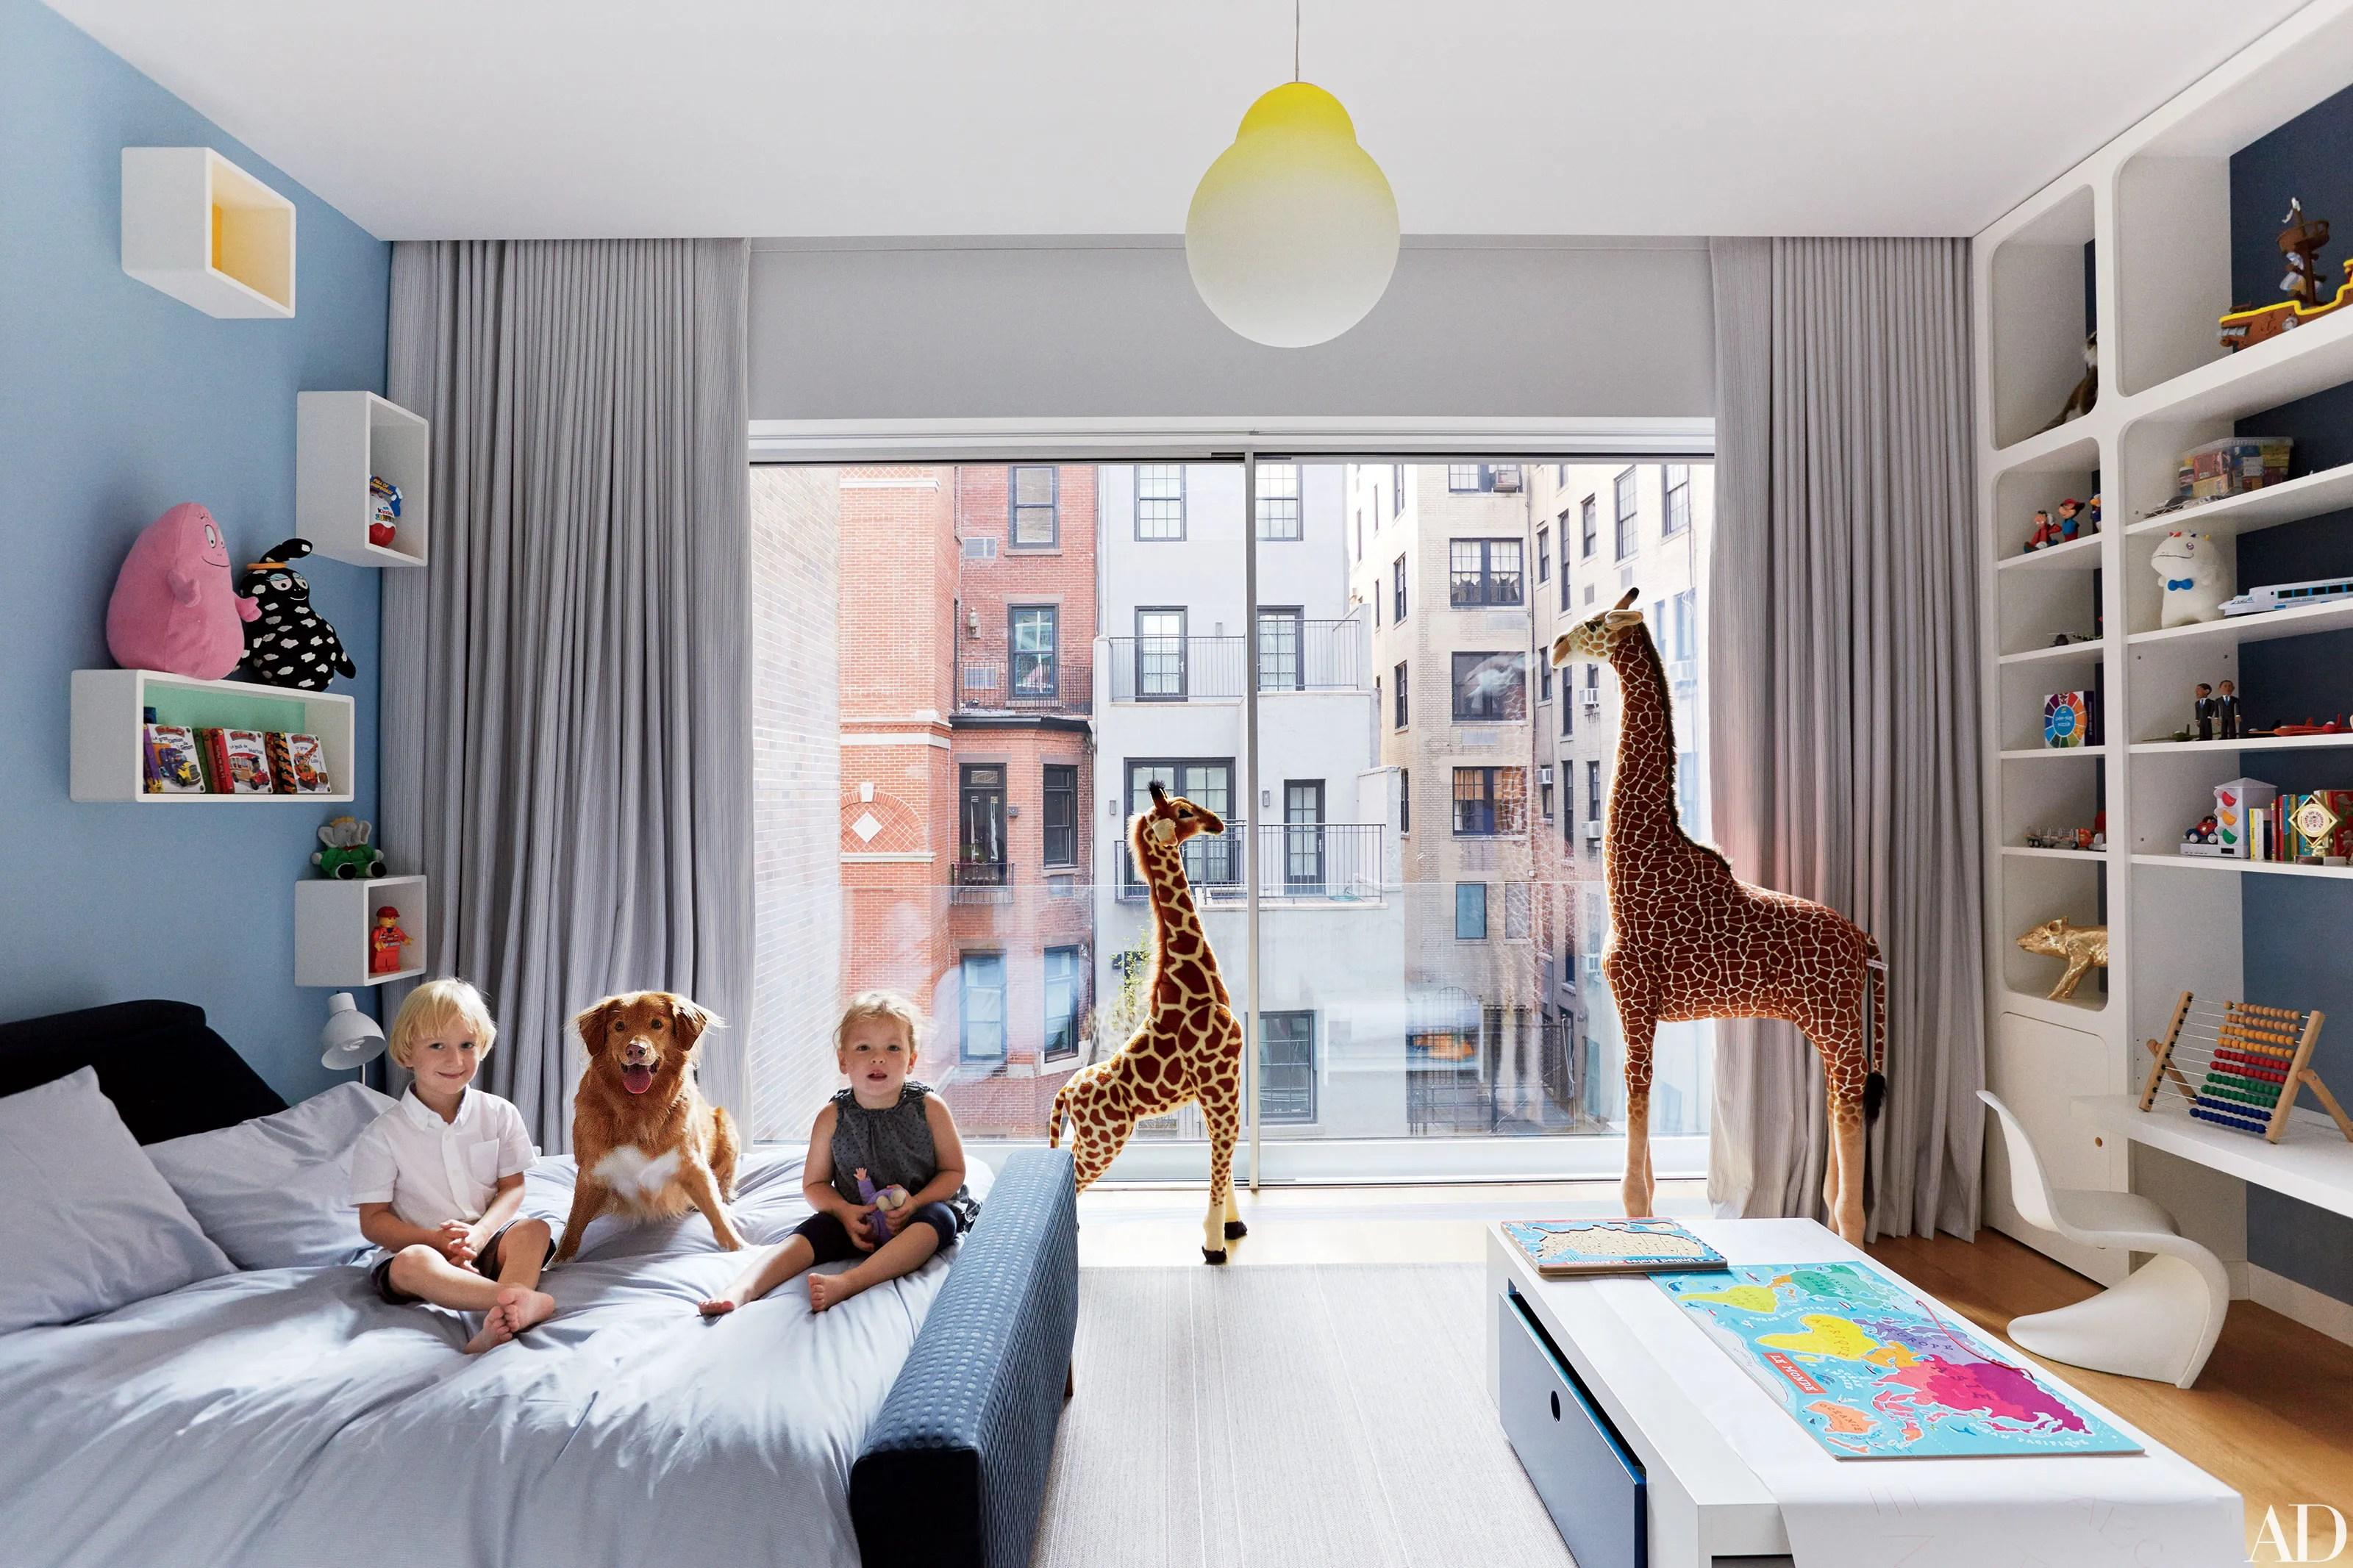 55 Stylish Children's Bedrooms And Nurseries Photos